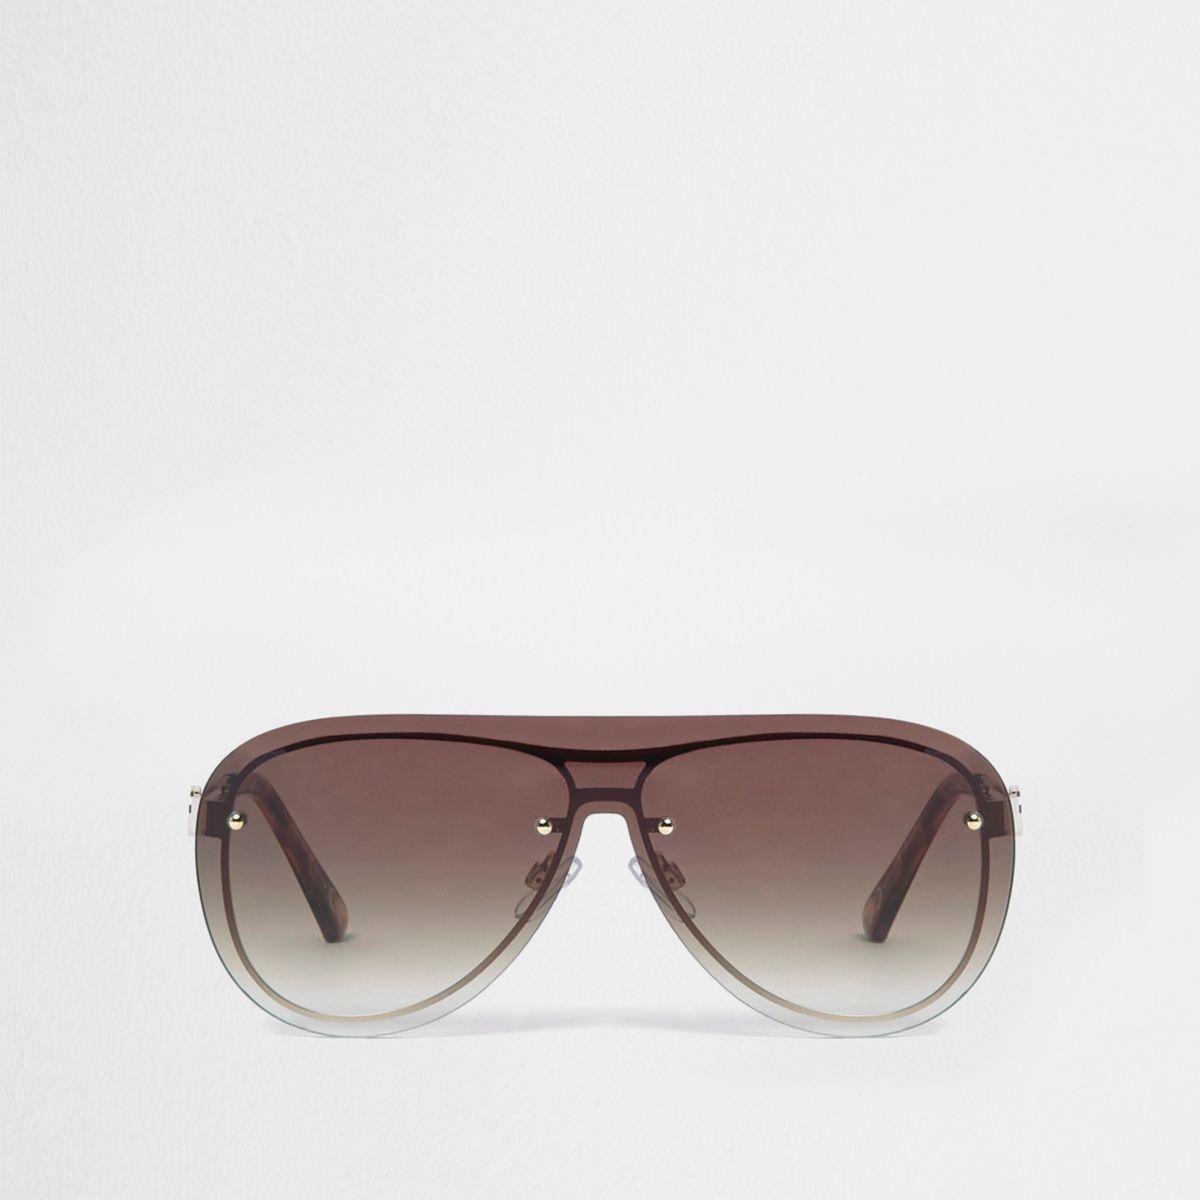 Gold tone visor aviator sunglasses